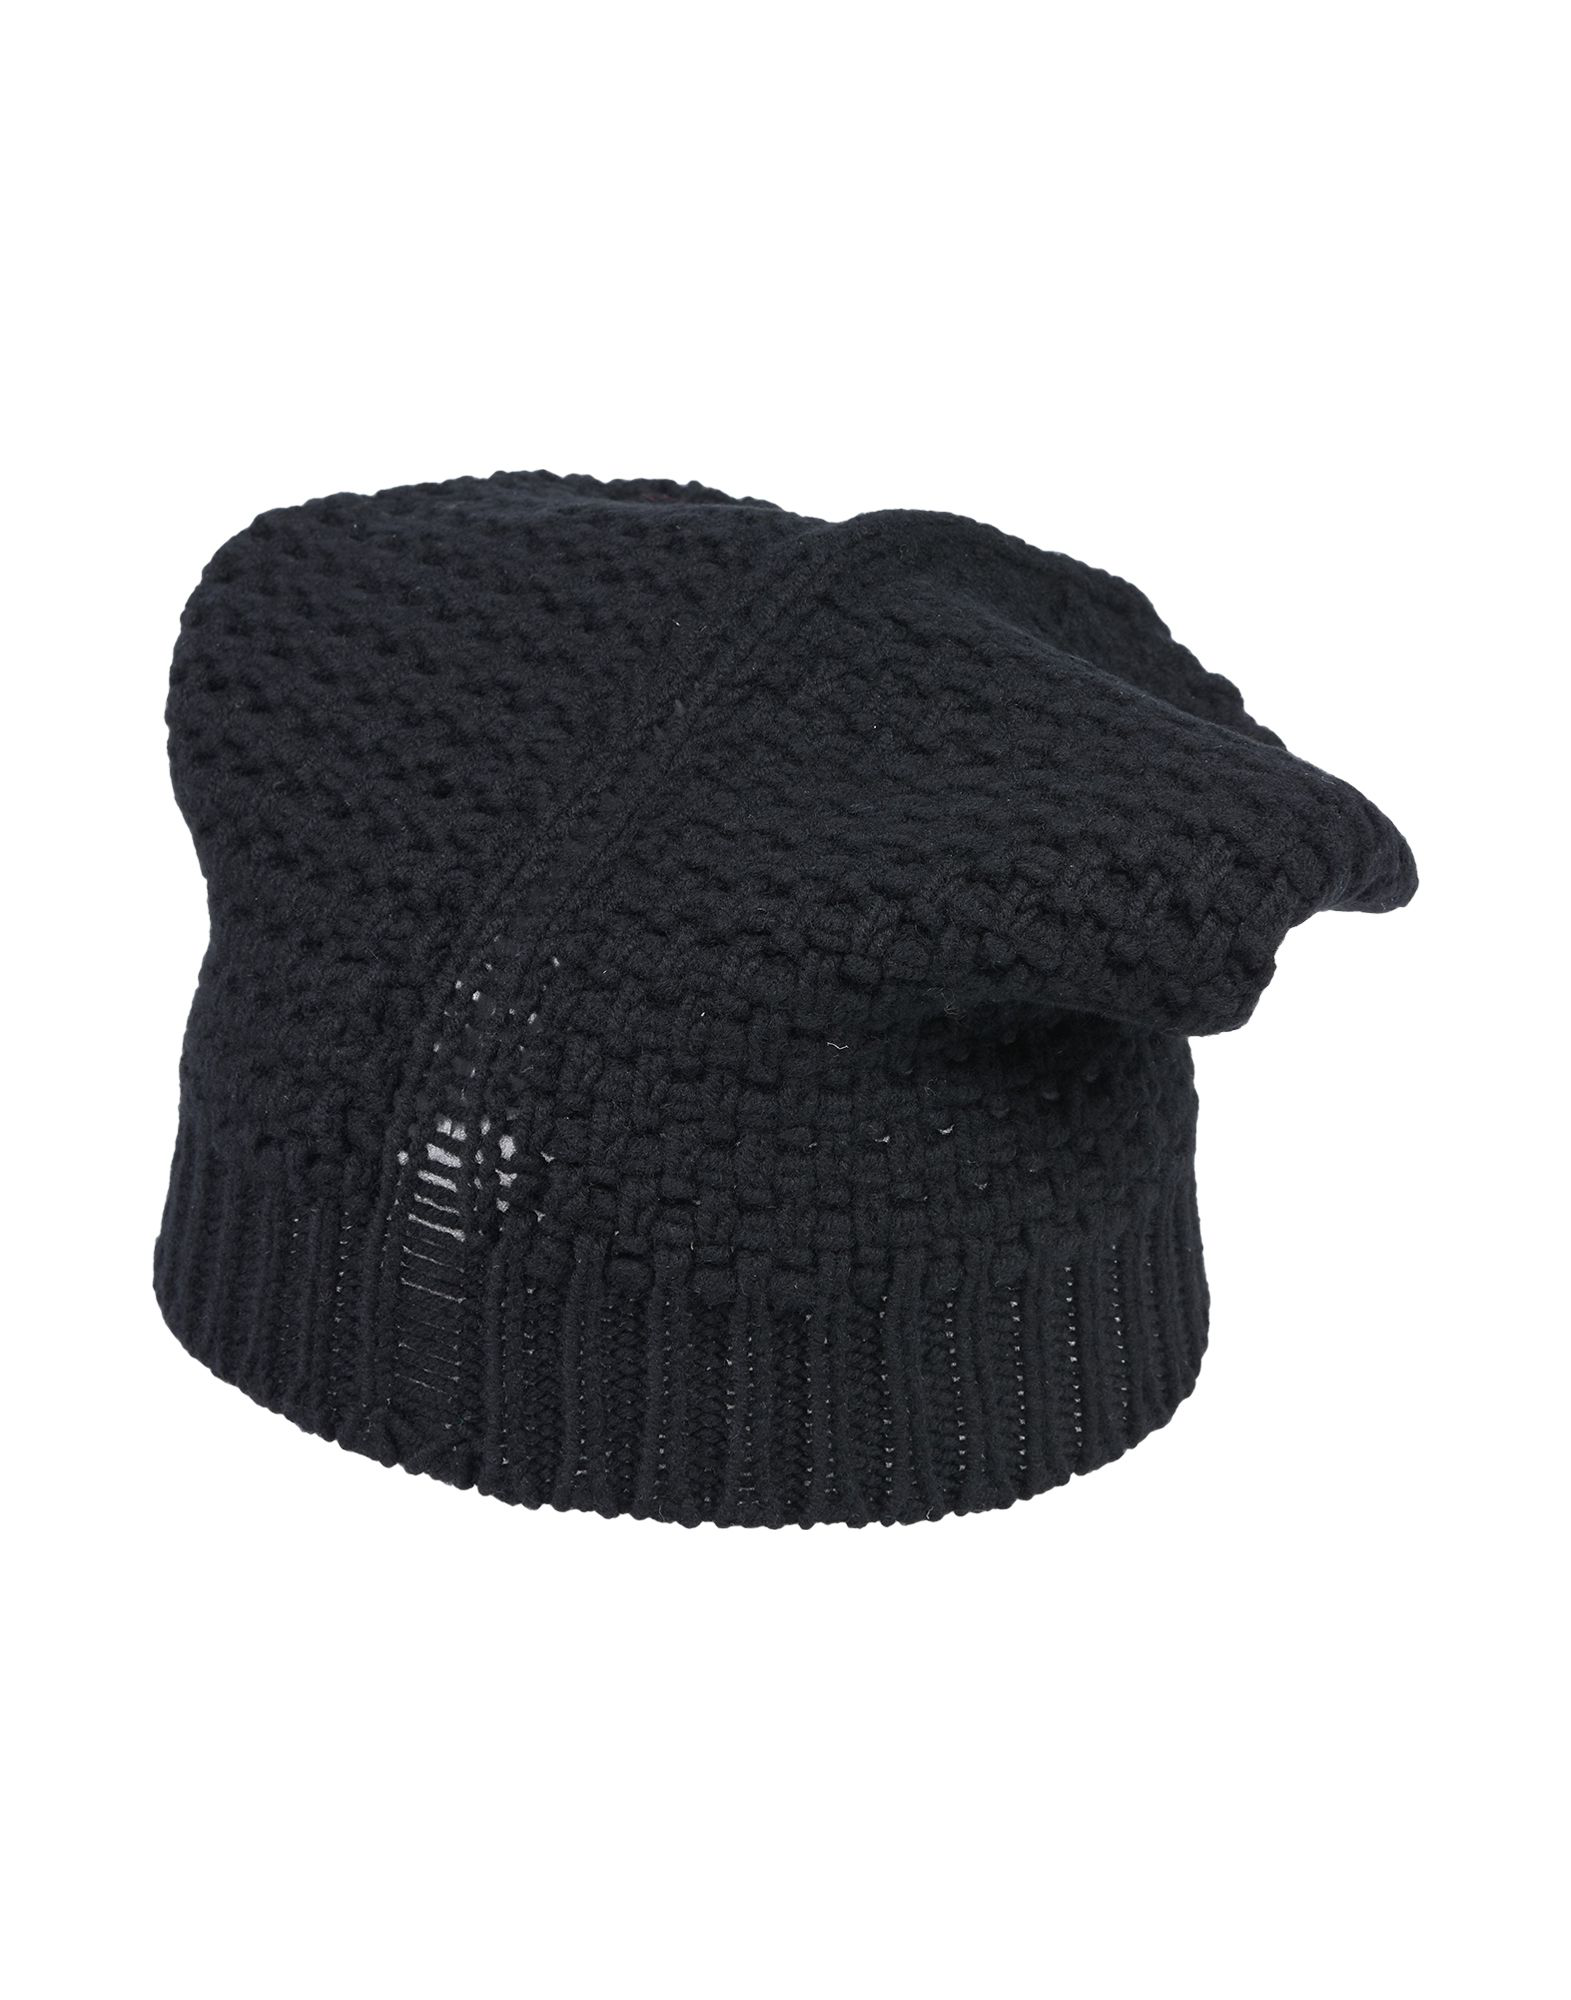 Rick Owens Hats In Black  b6c18204e400